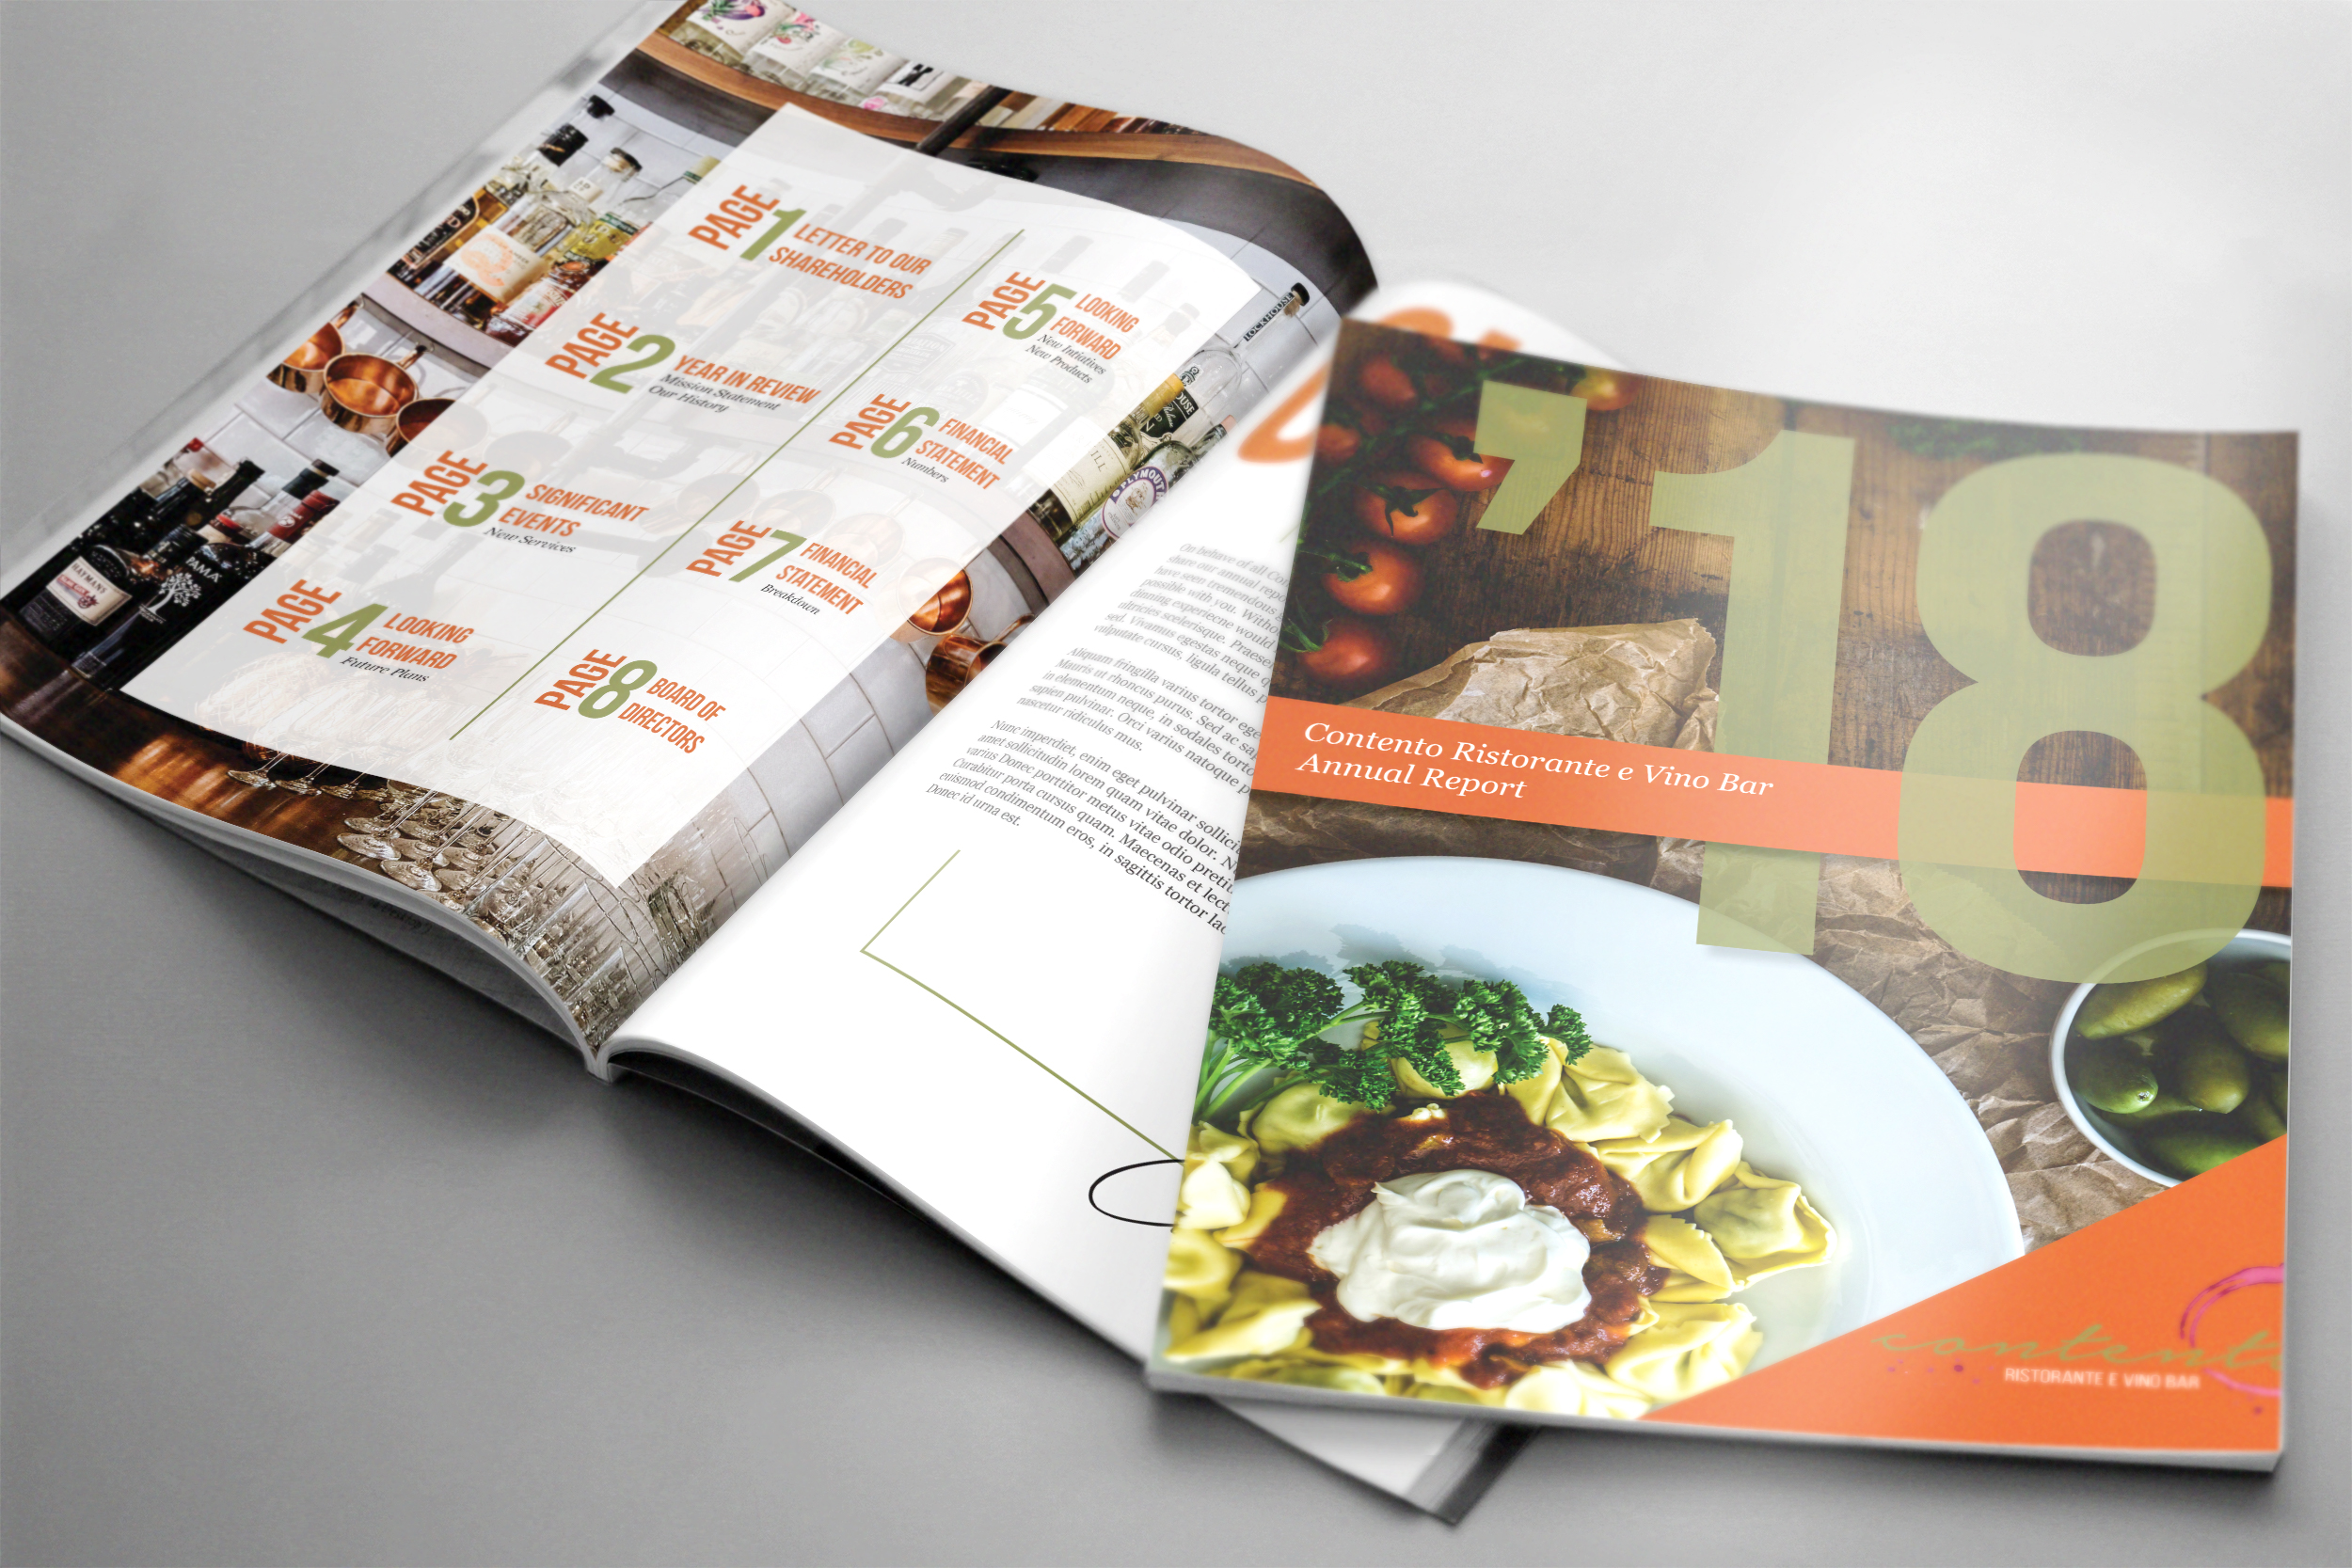 Annual Report for concept restaurant  Contento